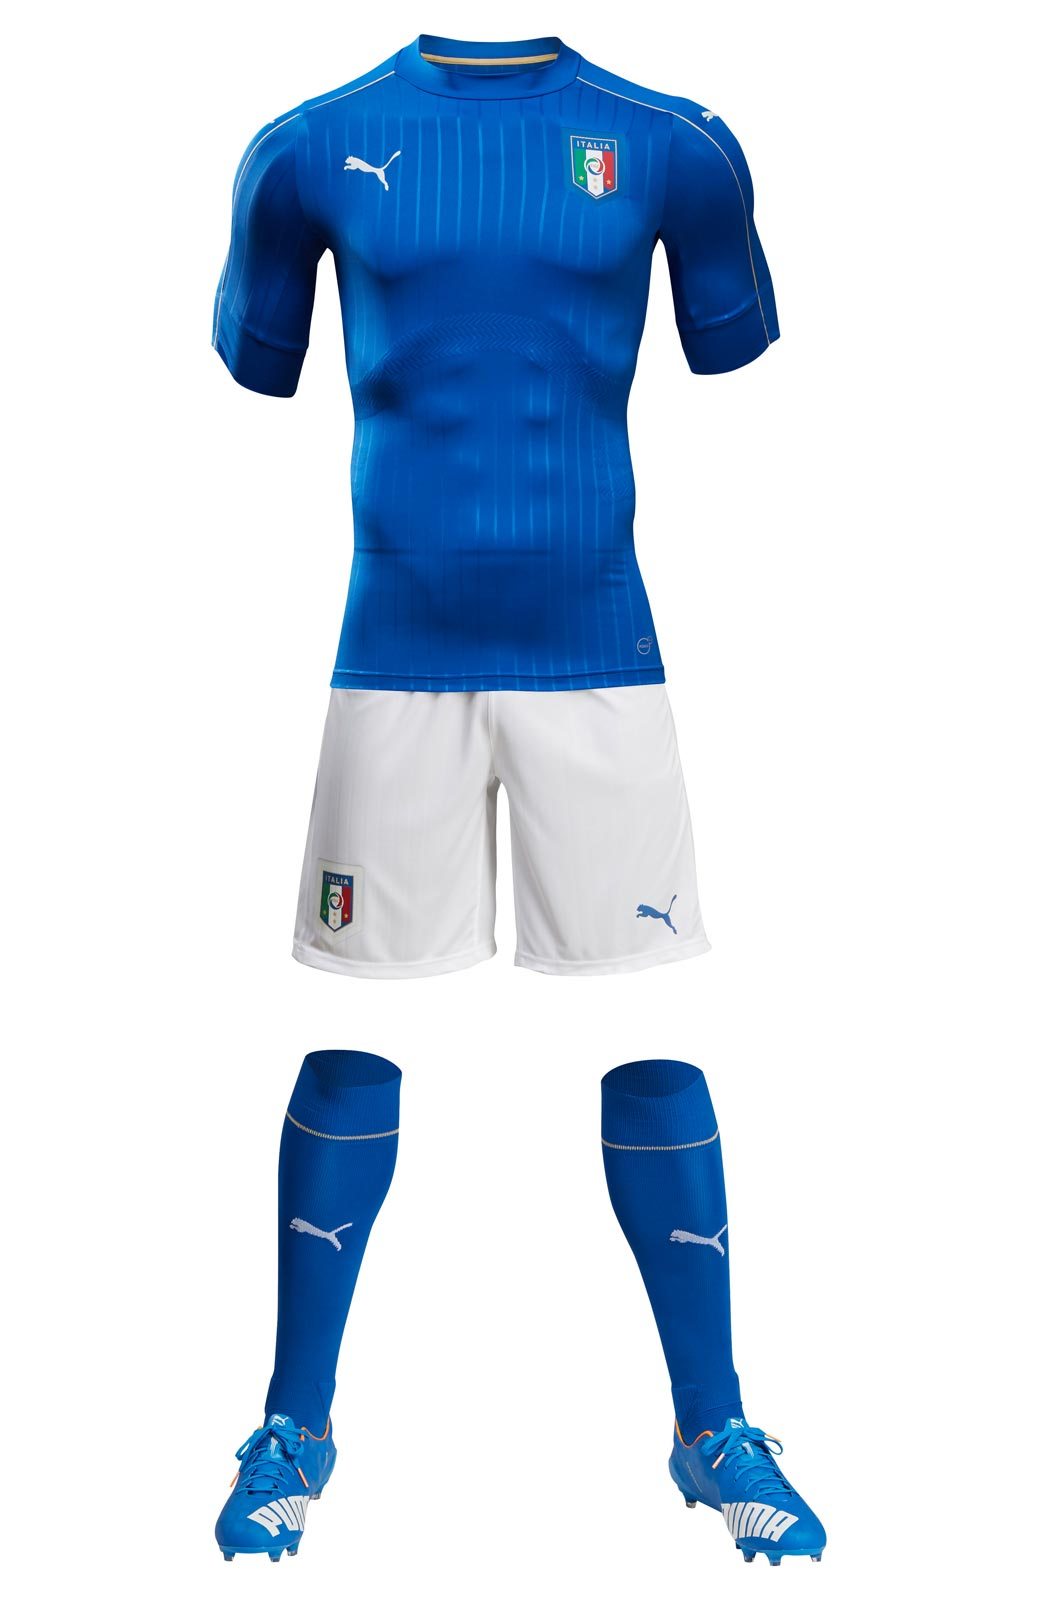 Puma Italy Euro 2016 Kit Released